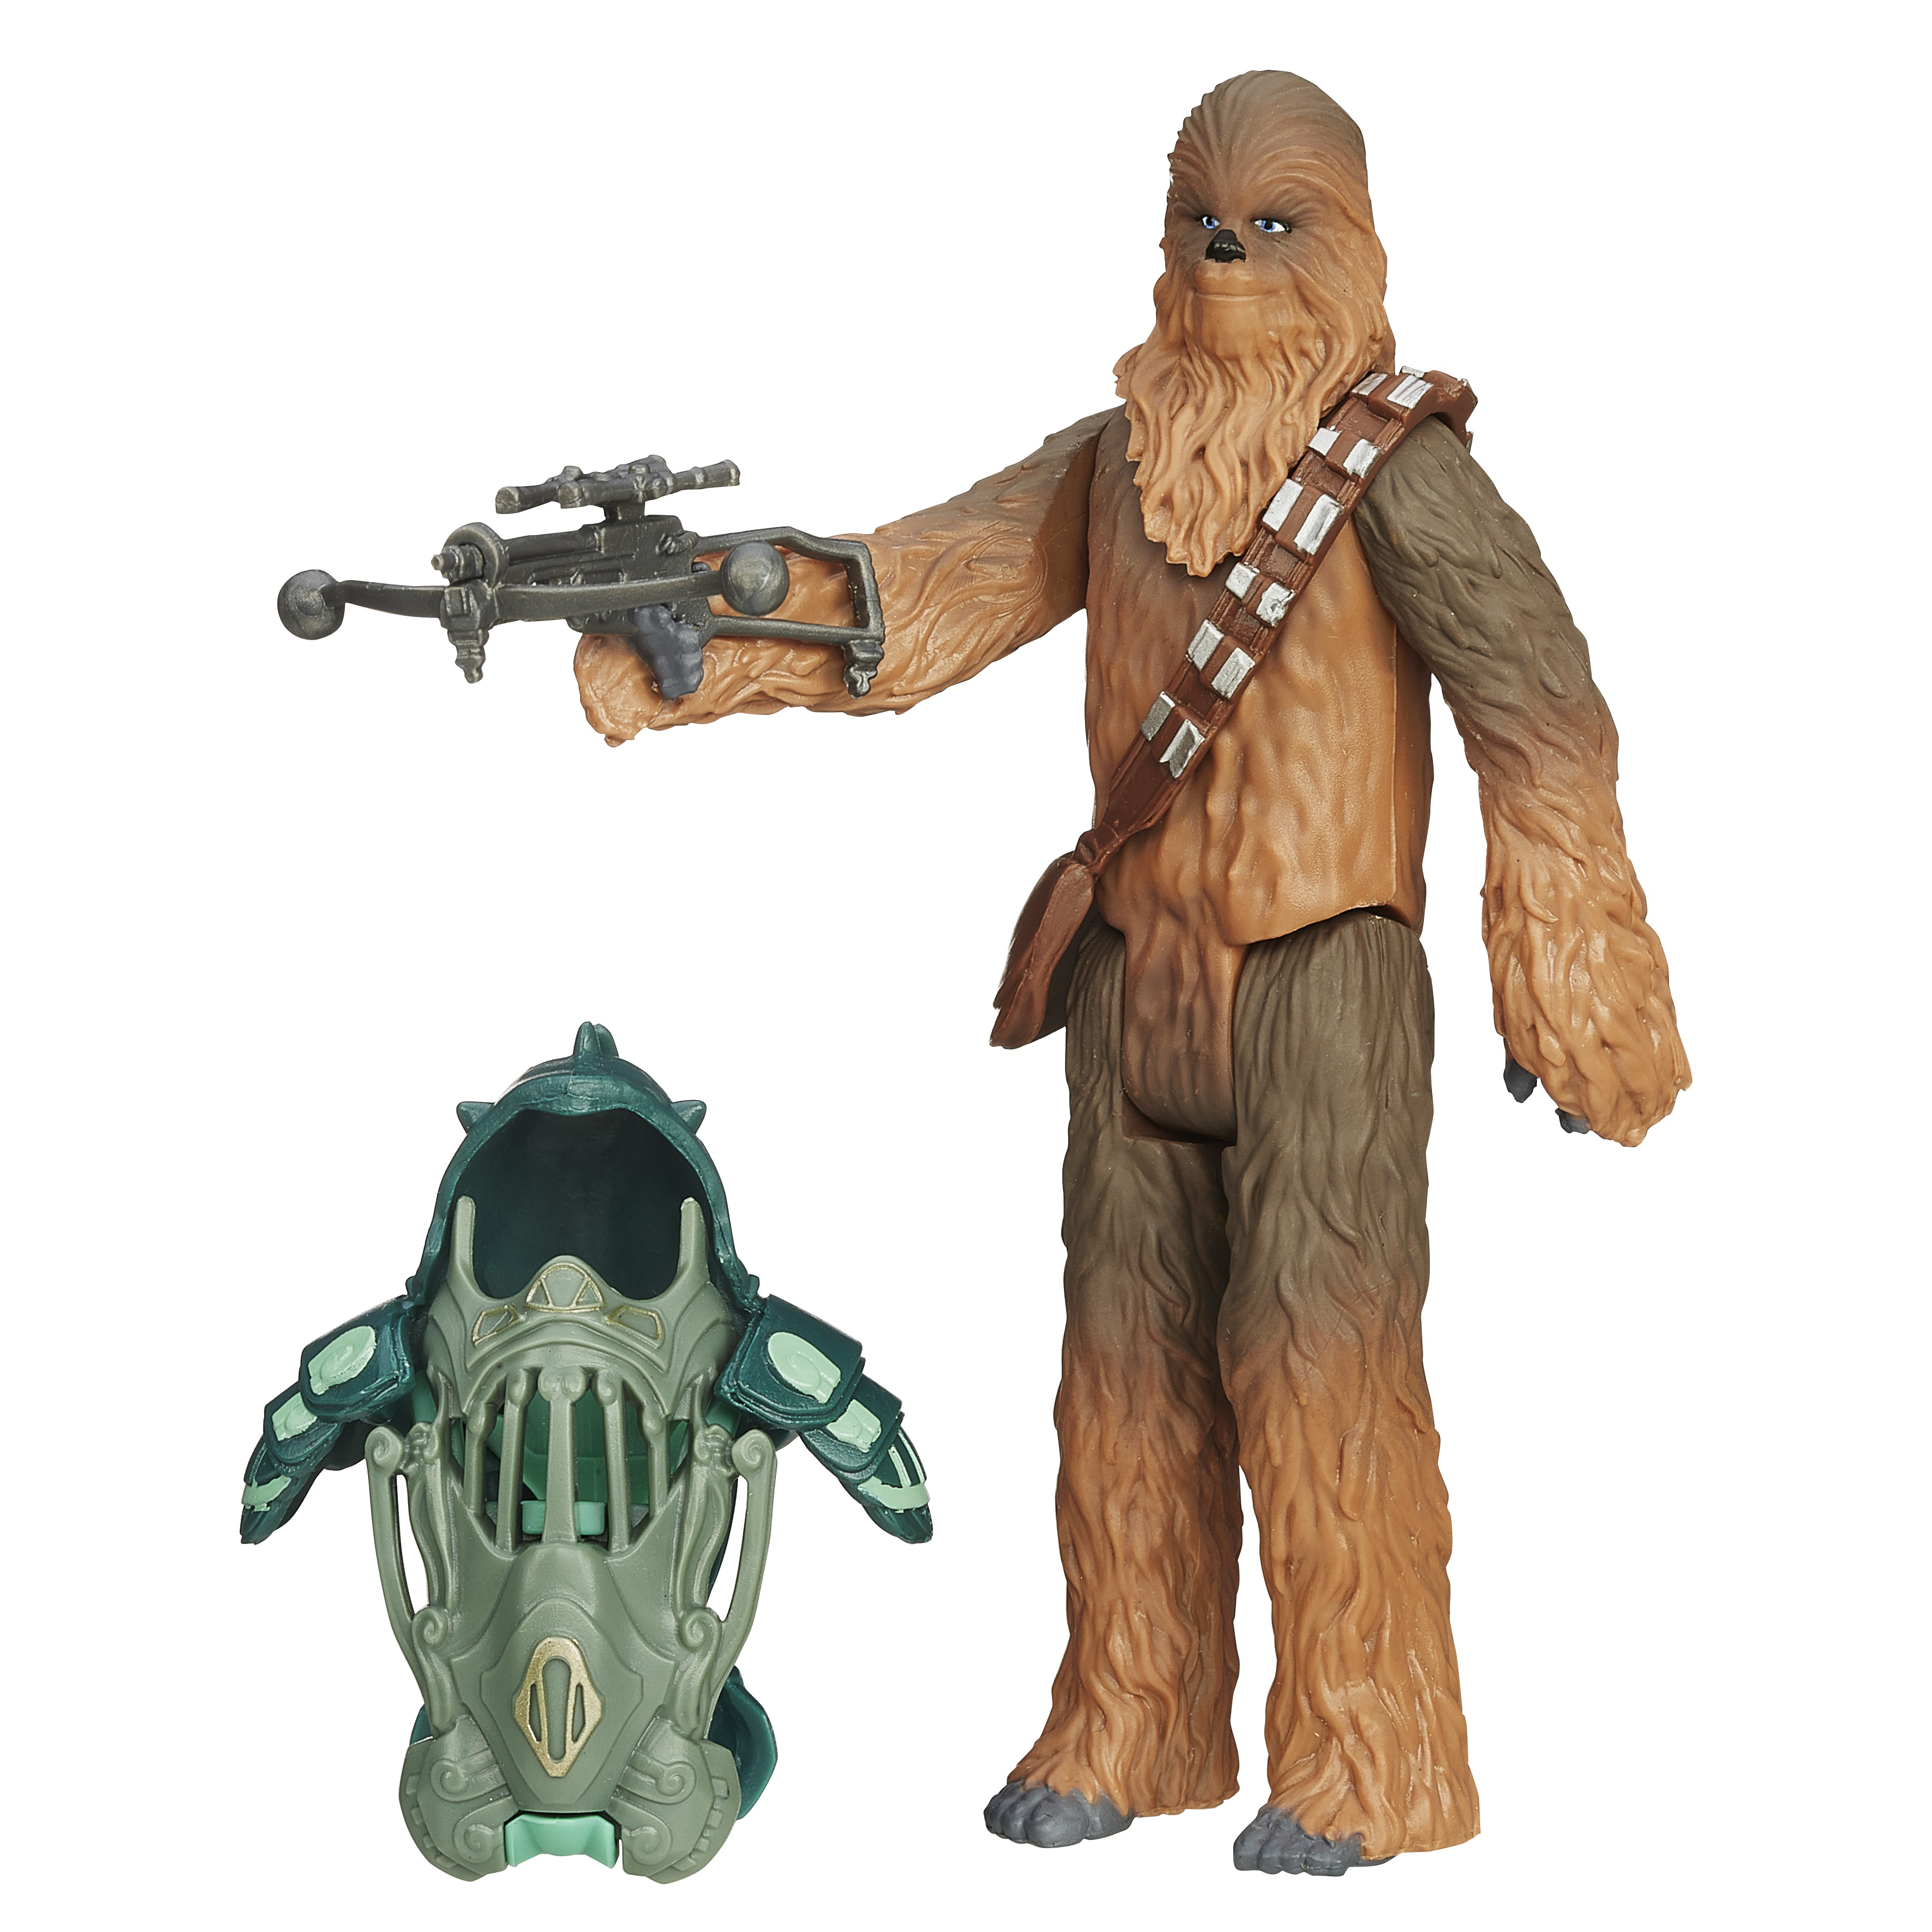 <b>Star Wars <i>The Force Awakens</i> Armor Up</b>; Chewbacca